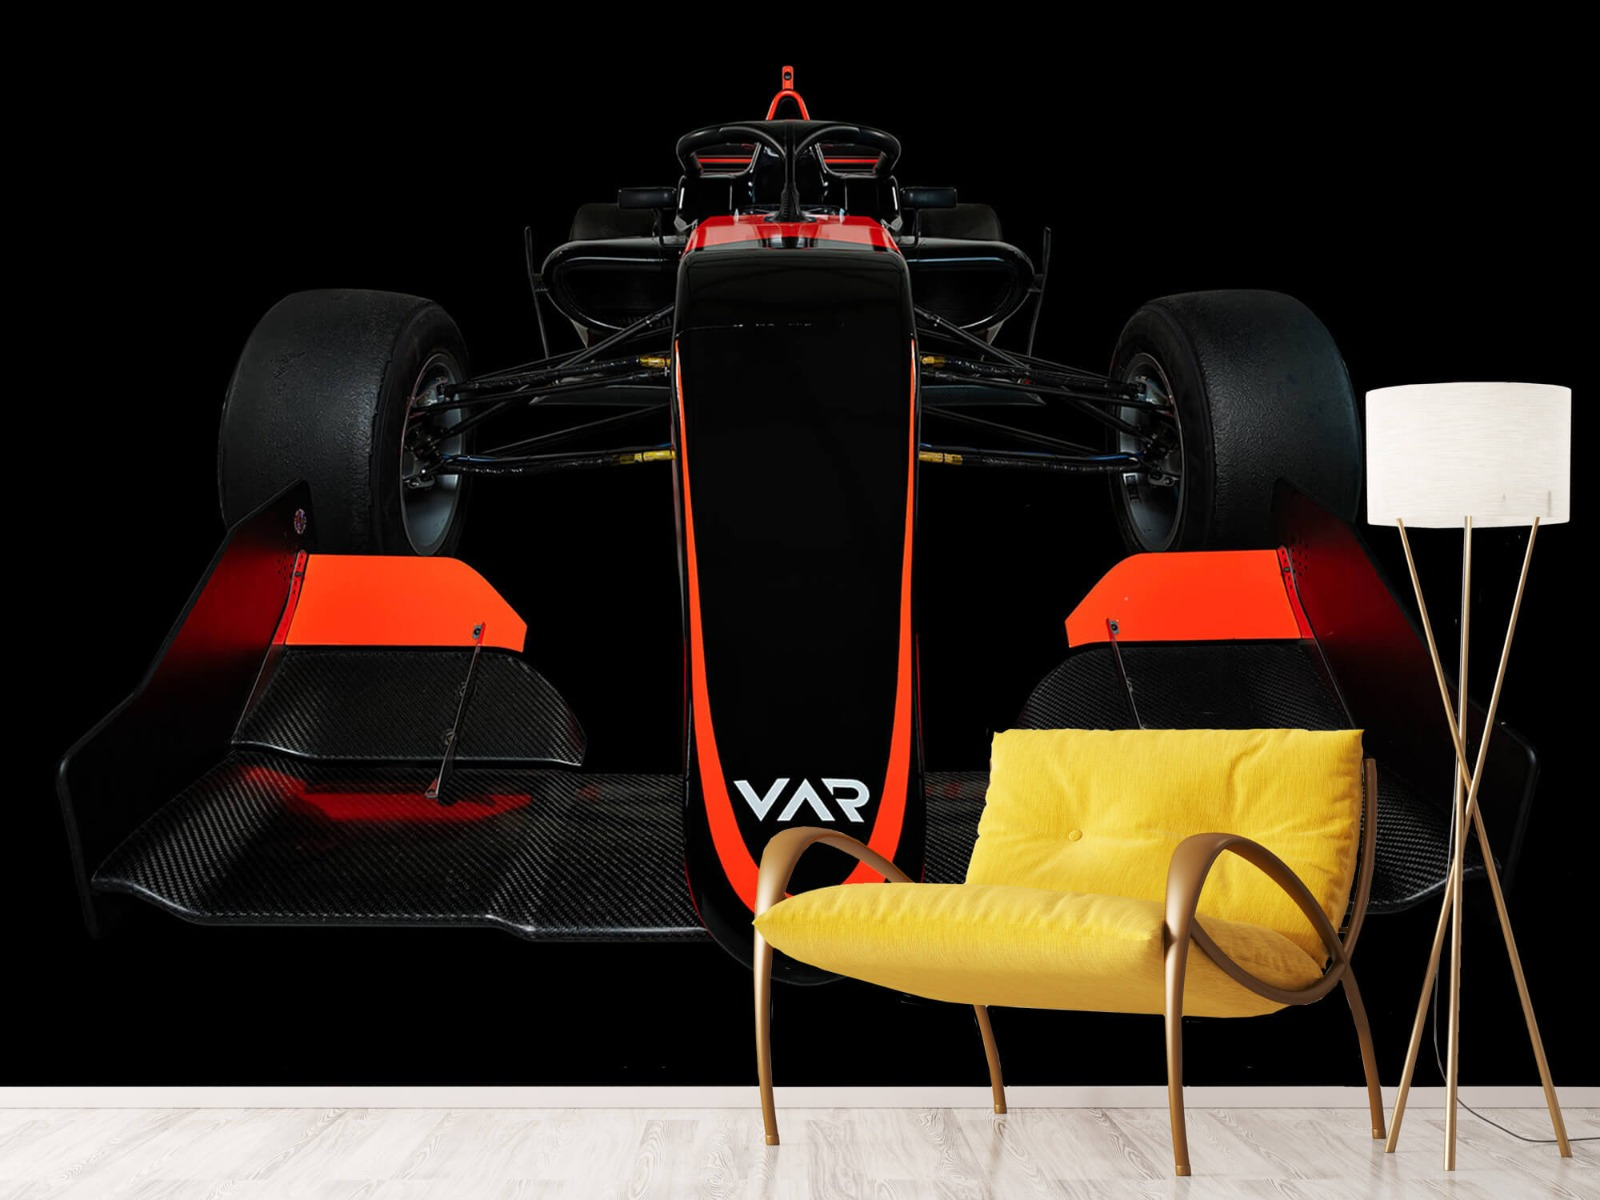 Sportauto's - Formule 3 - Lower front view - dark - Slaapkamer 11